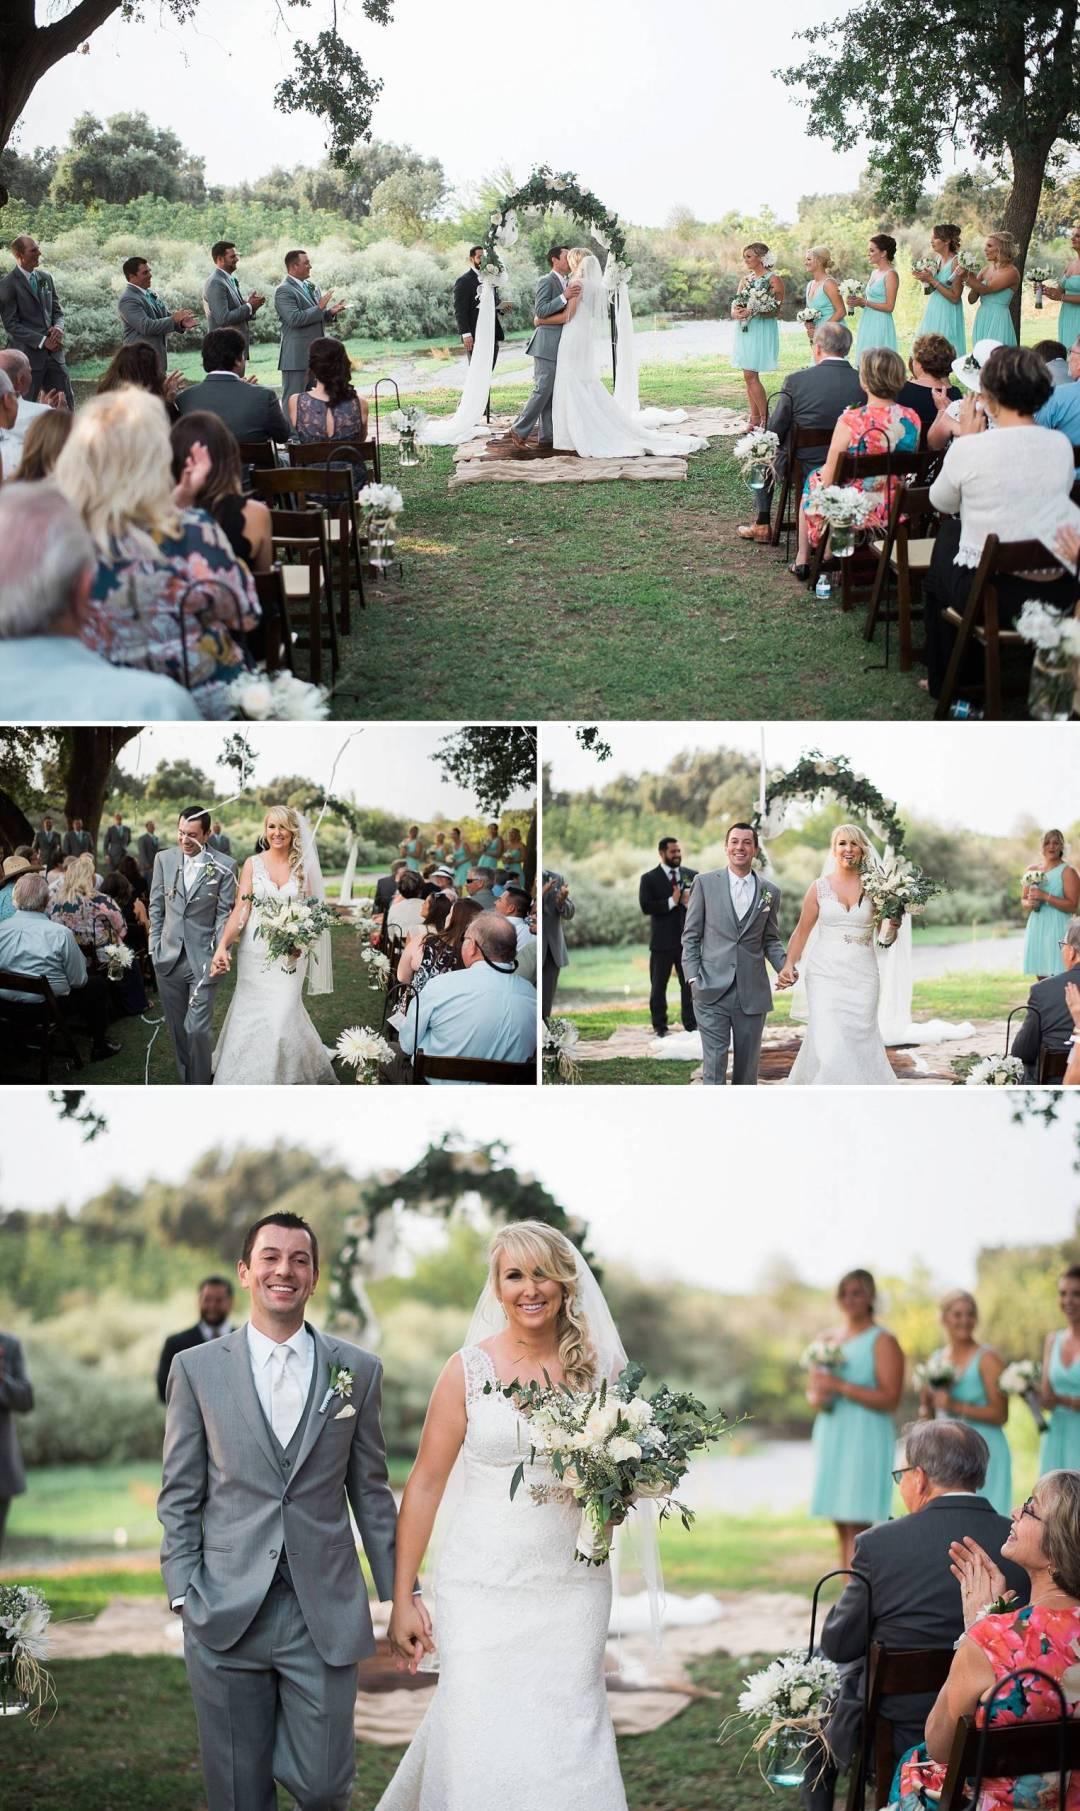 Erin + Marcel Third Element Photography & Cinema Fresno County Estate Wedding Hybrid Film Wedding Photographer_0036